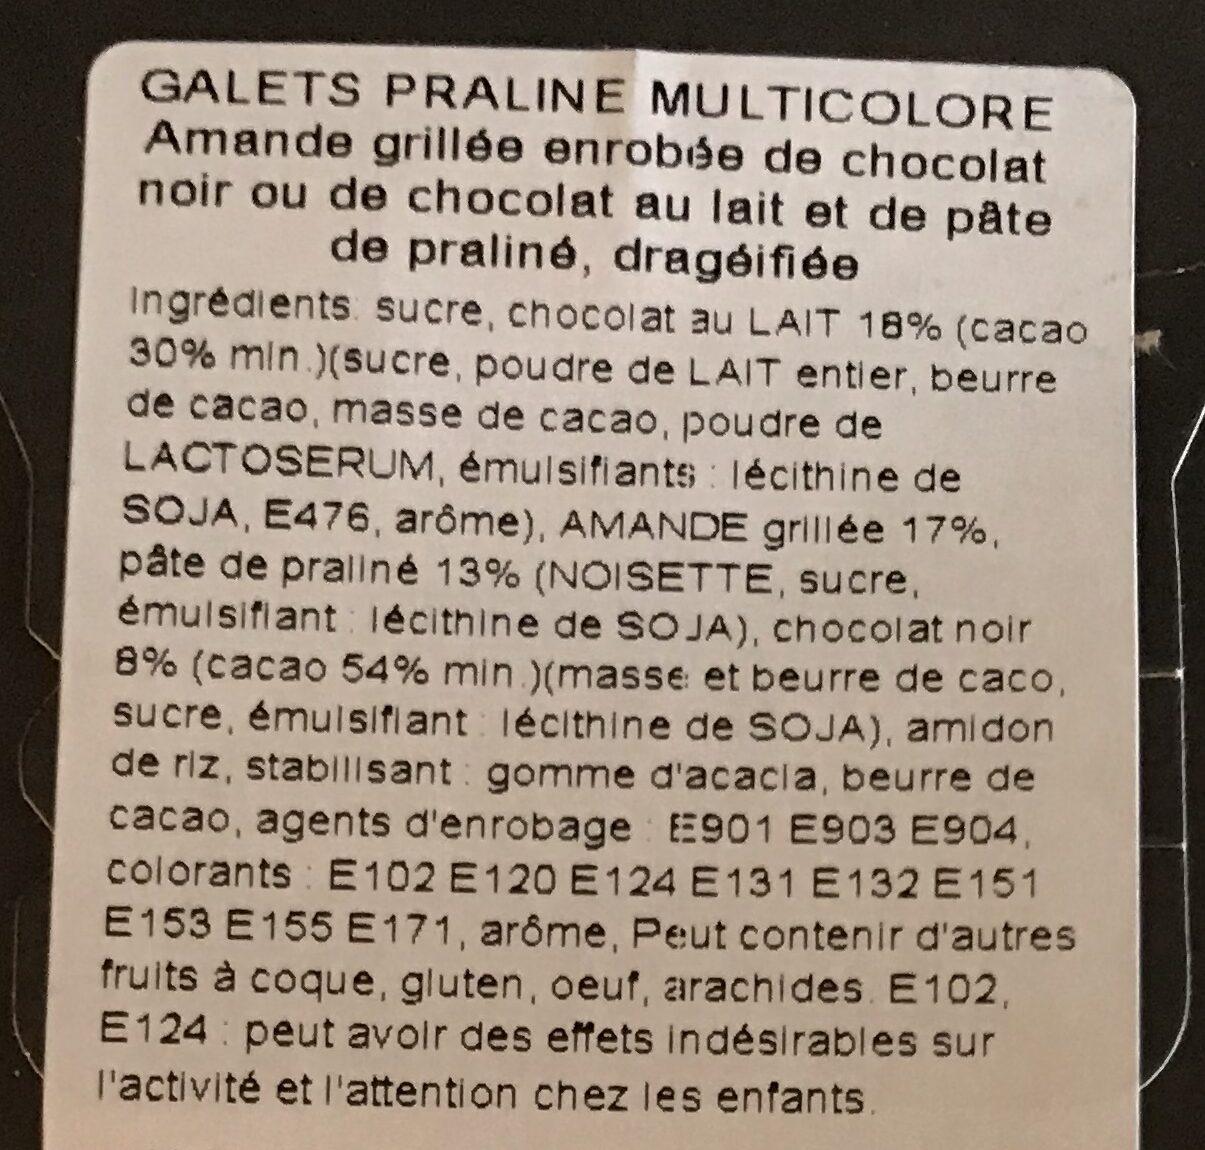 Galets praline multicolore - Ingrédients - fr